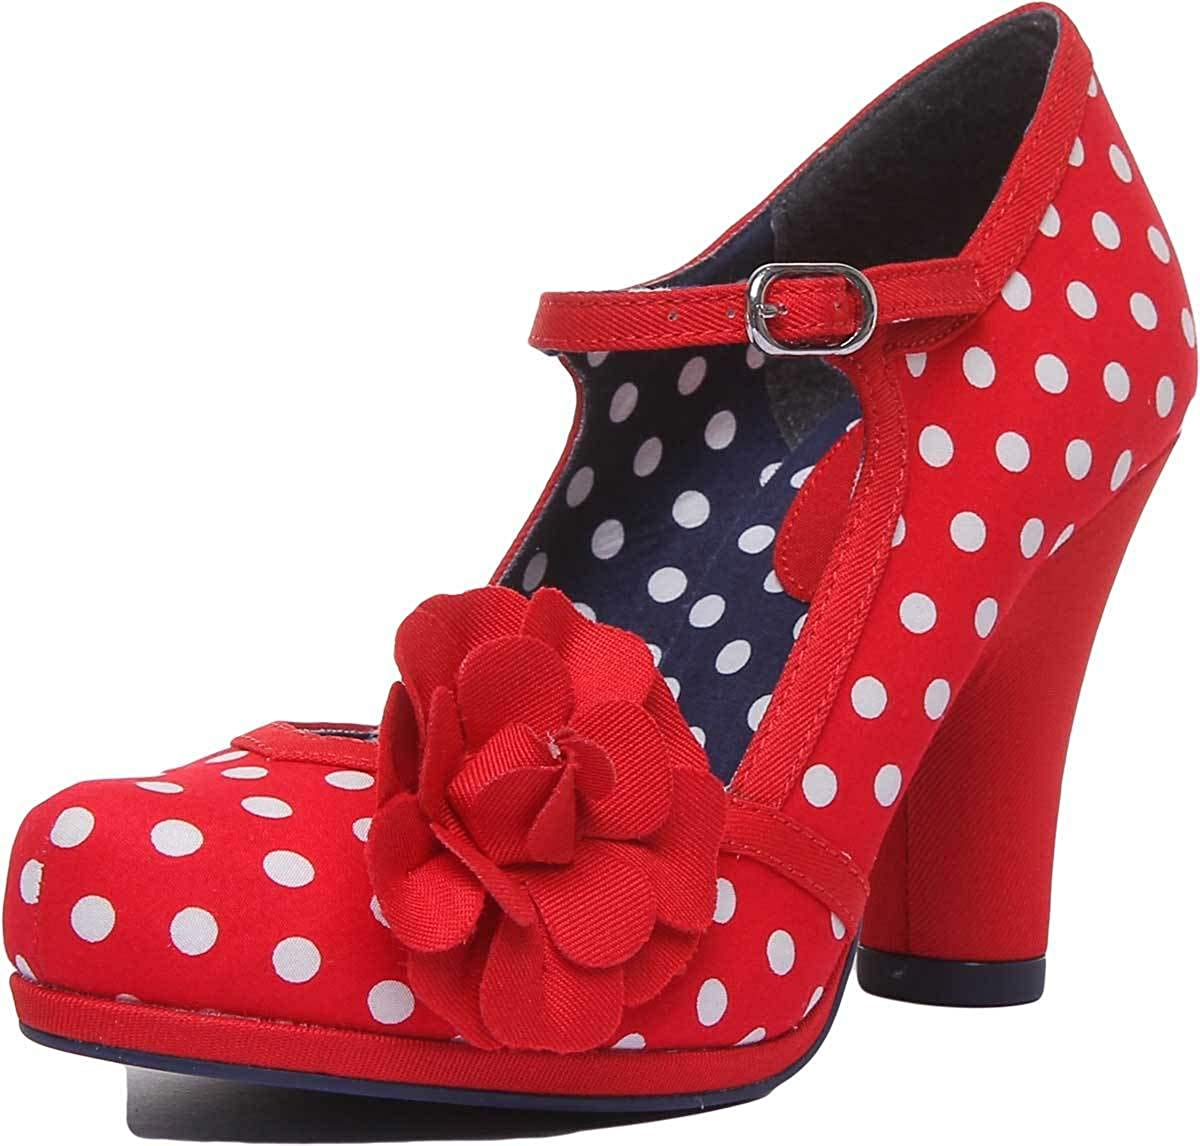 RUBY SHOO HANNAH red spots MARY JANE polka dot SHOES HEELS